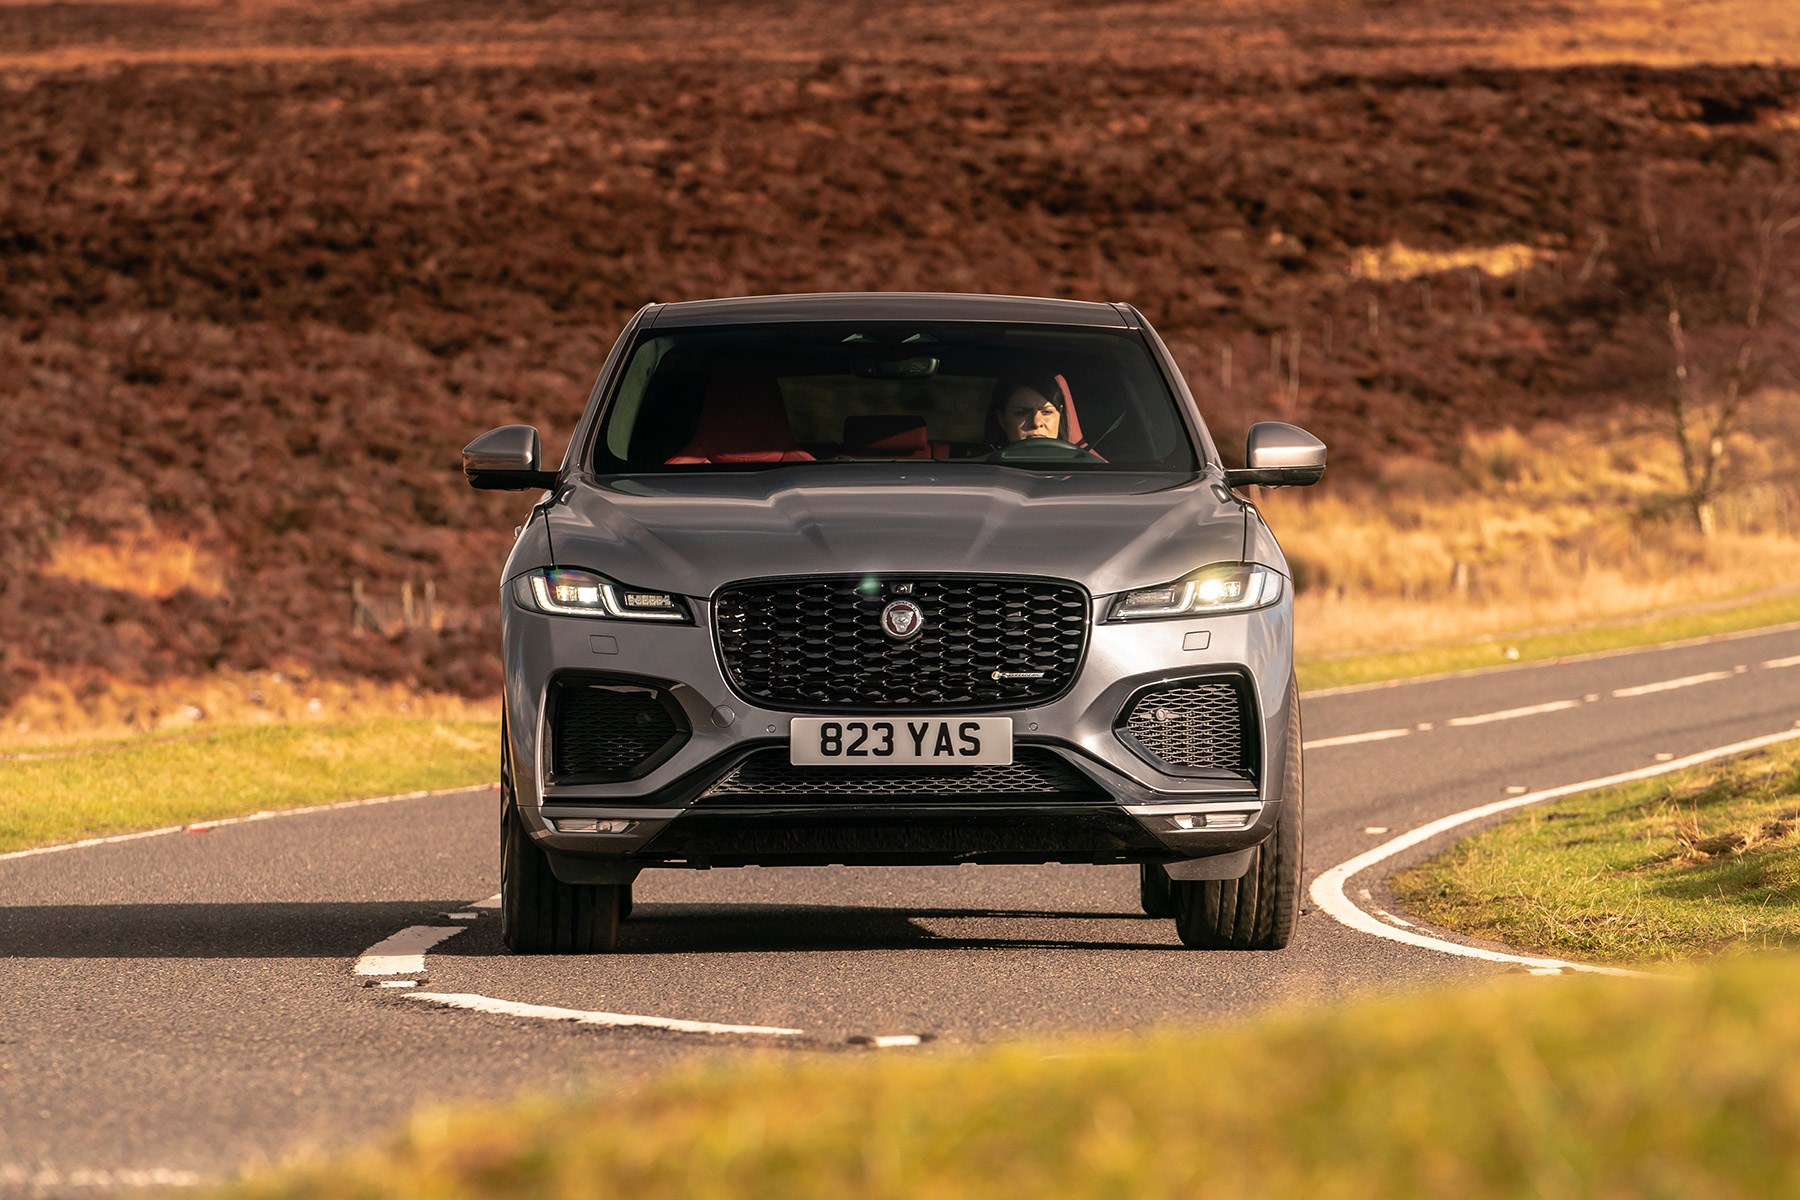 Jaguar F-Pace 2021 handling